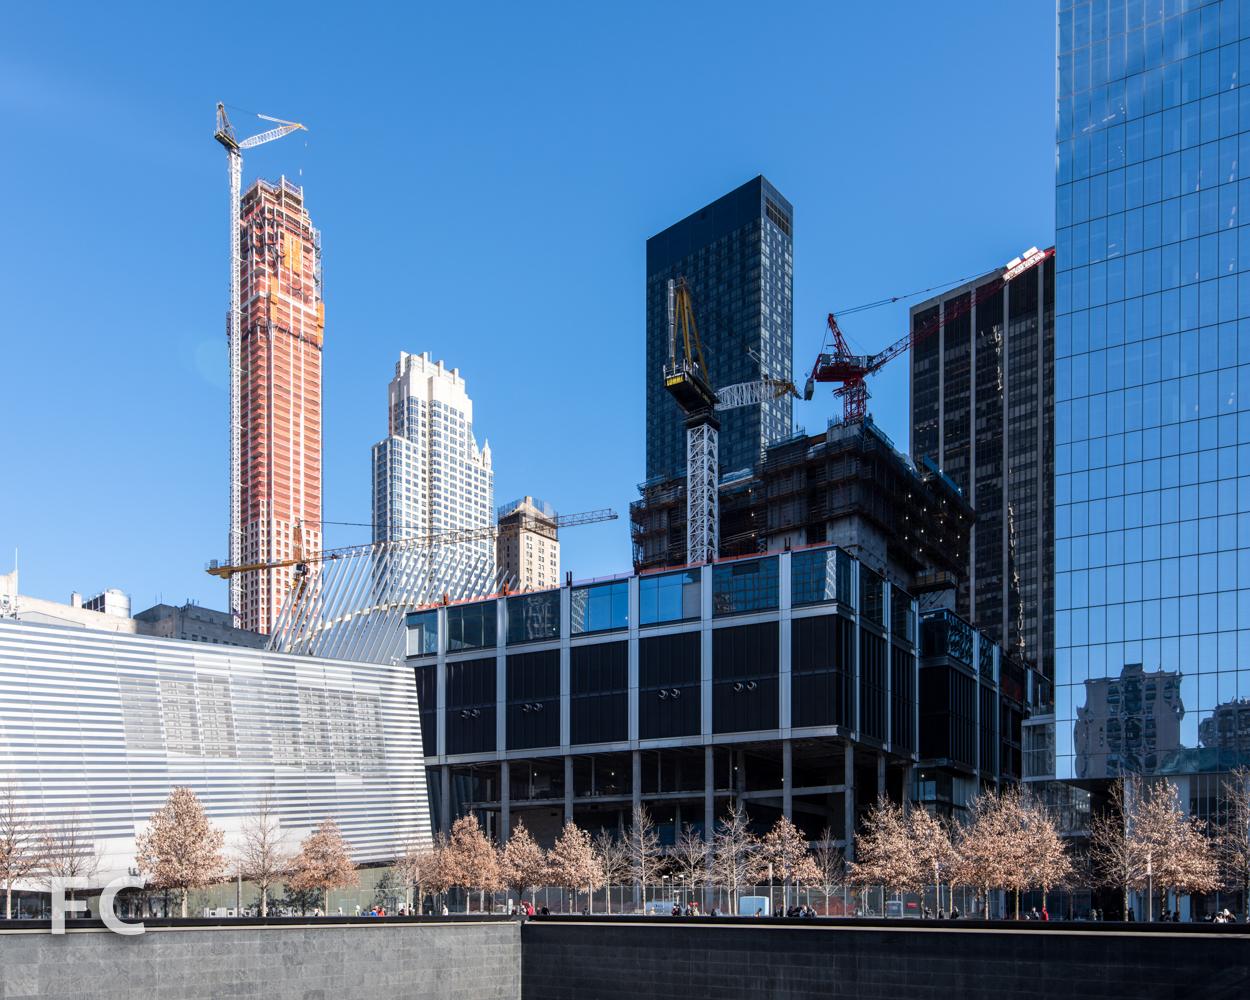 Southwest corner of 3 World Trade Center from the World Trade Center Memorial.